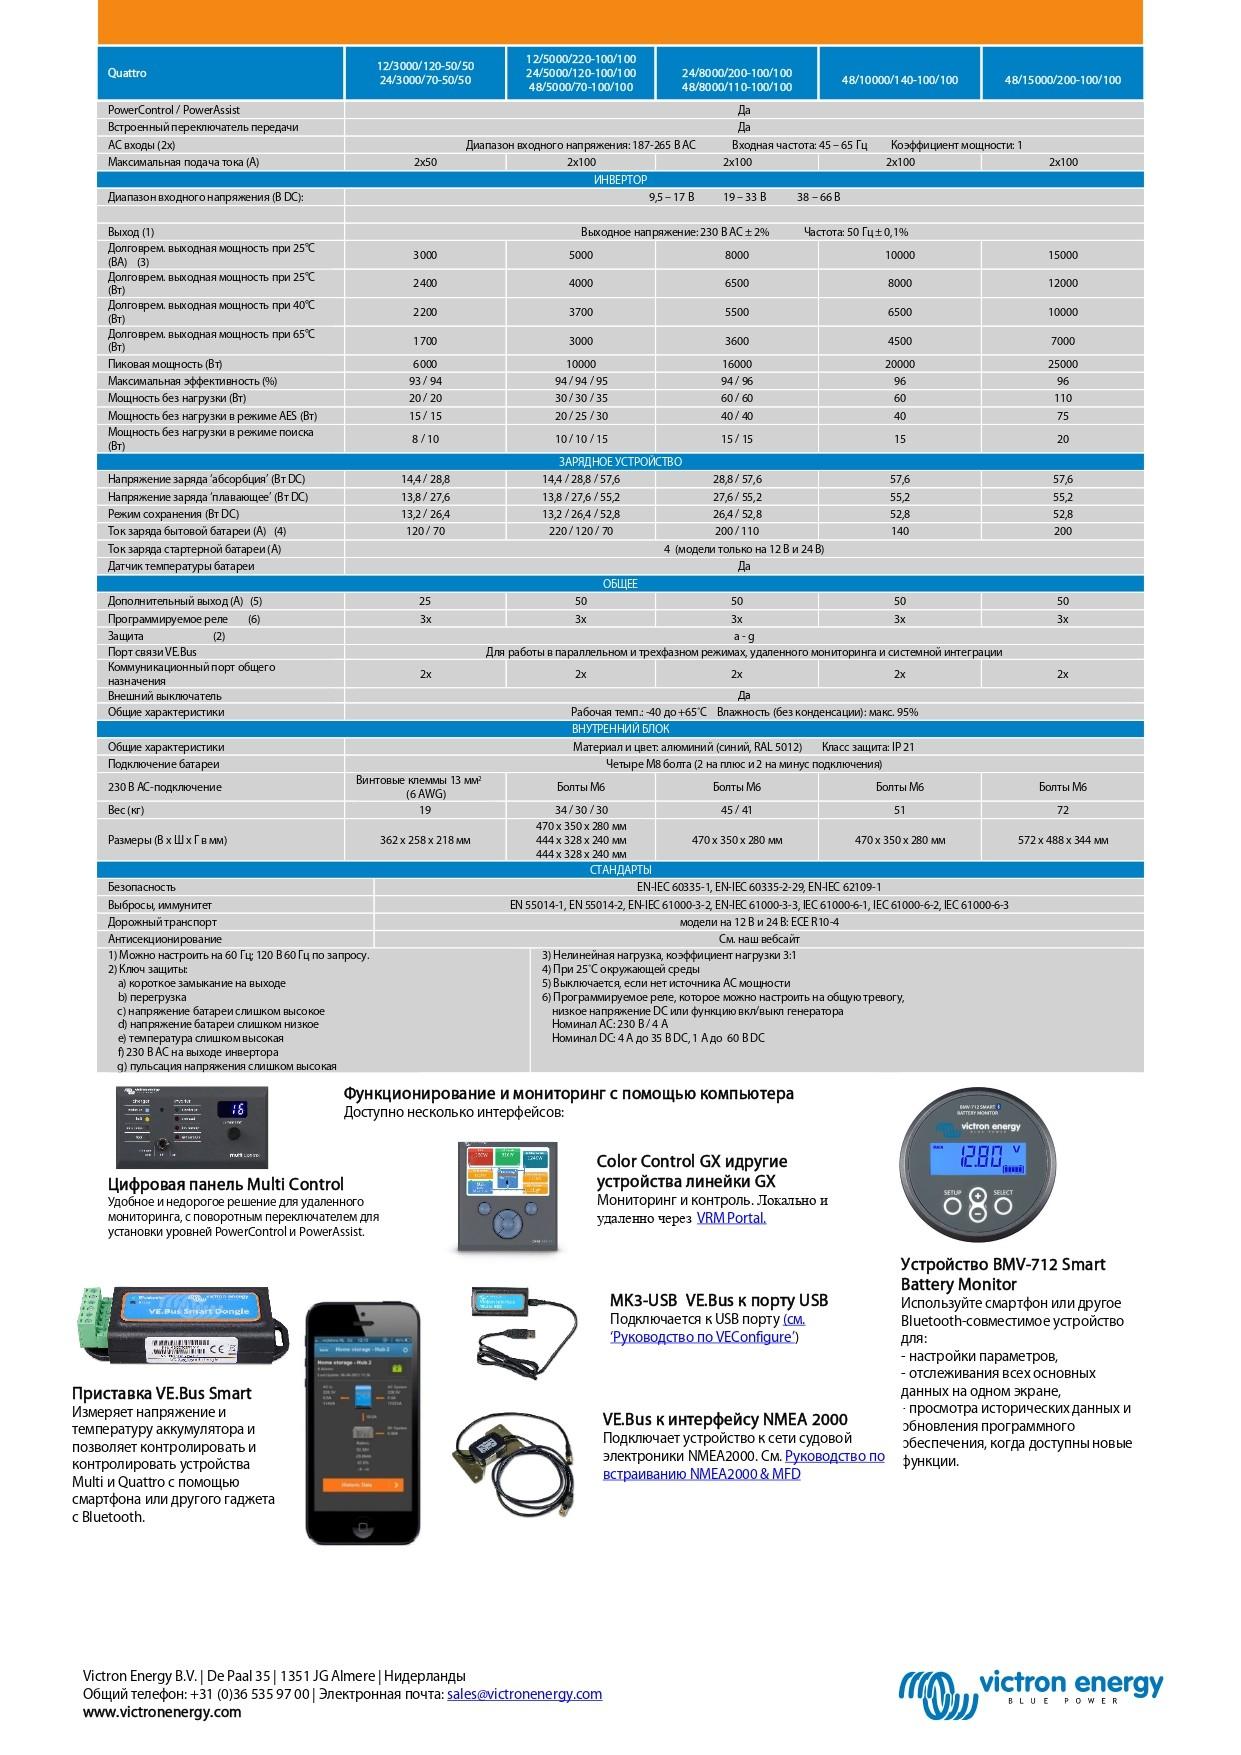 Инвертор/Зарядное устройство Quattro СОЛЕНСИ